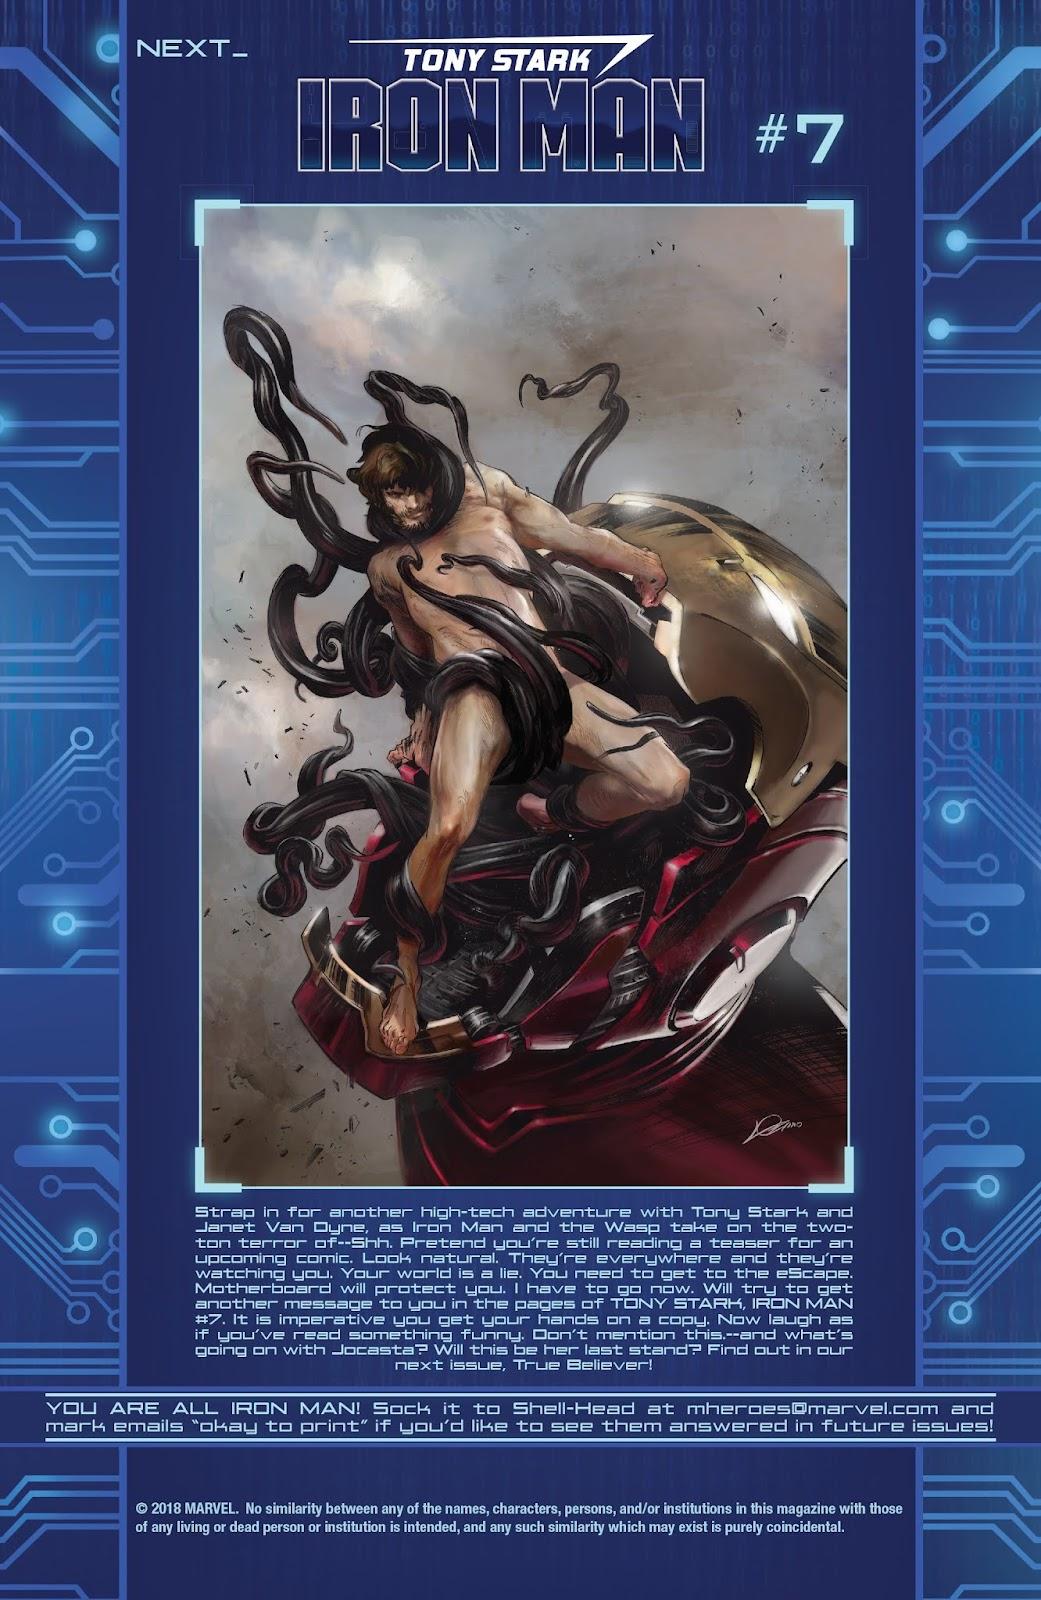 Read online Tony Stark: Iron Man comic -  Issue #6 - 22